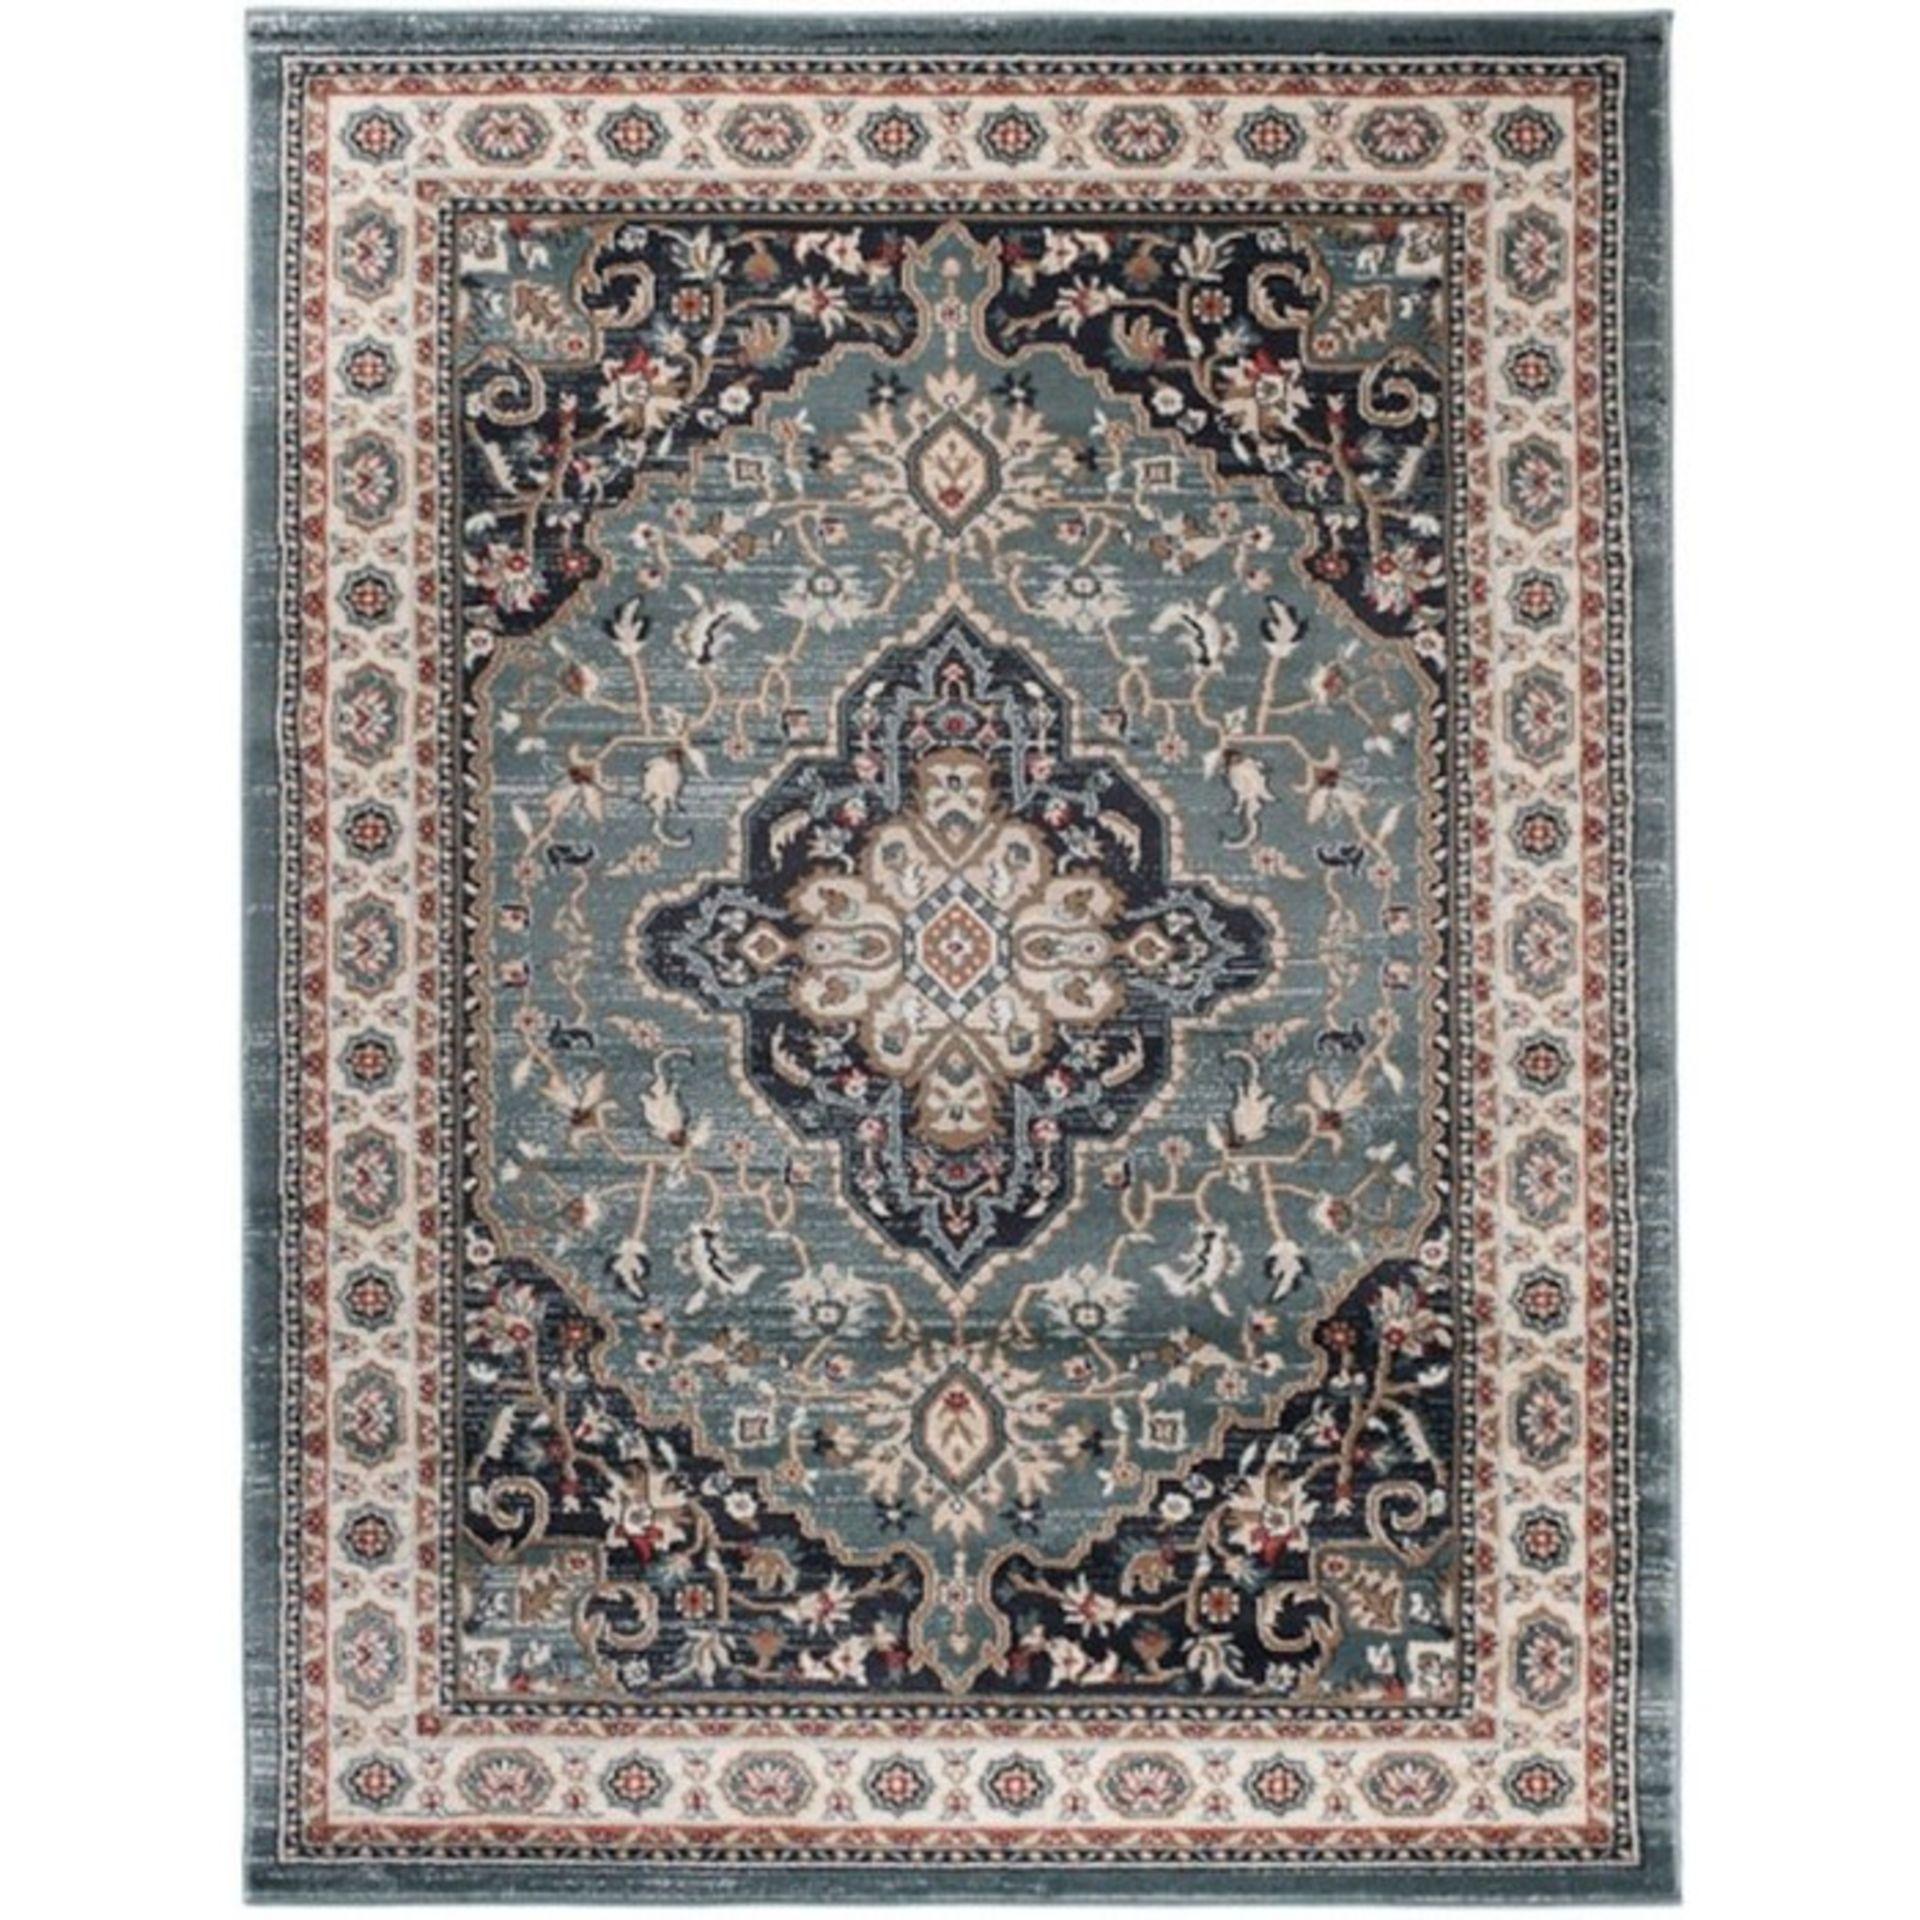 Longweave,Zeke Green/Blue Rug RRP -£61.99 (120x170cm) (14006/46 -LOWV1593)